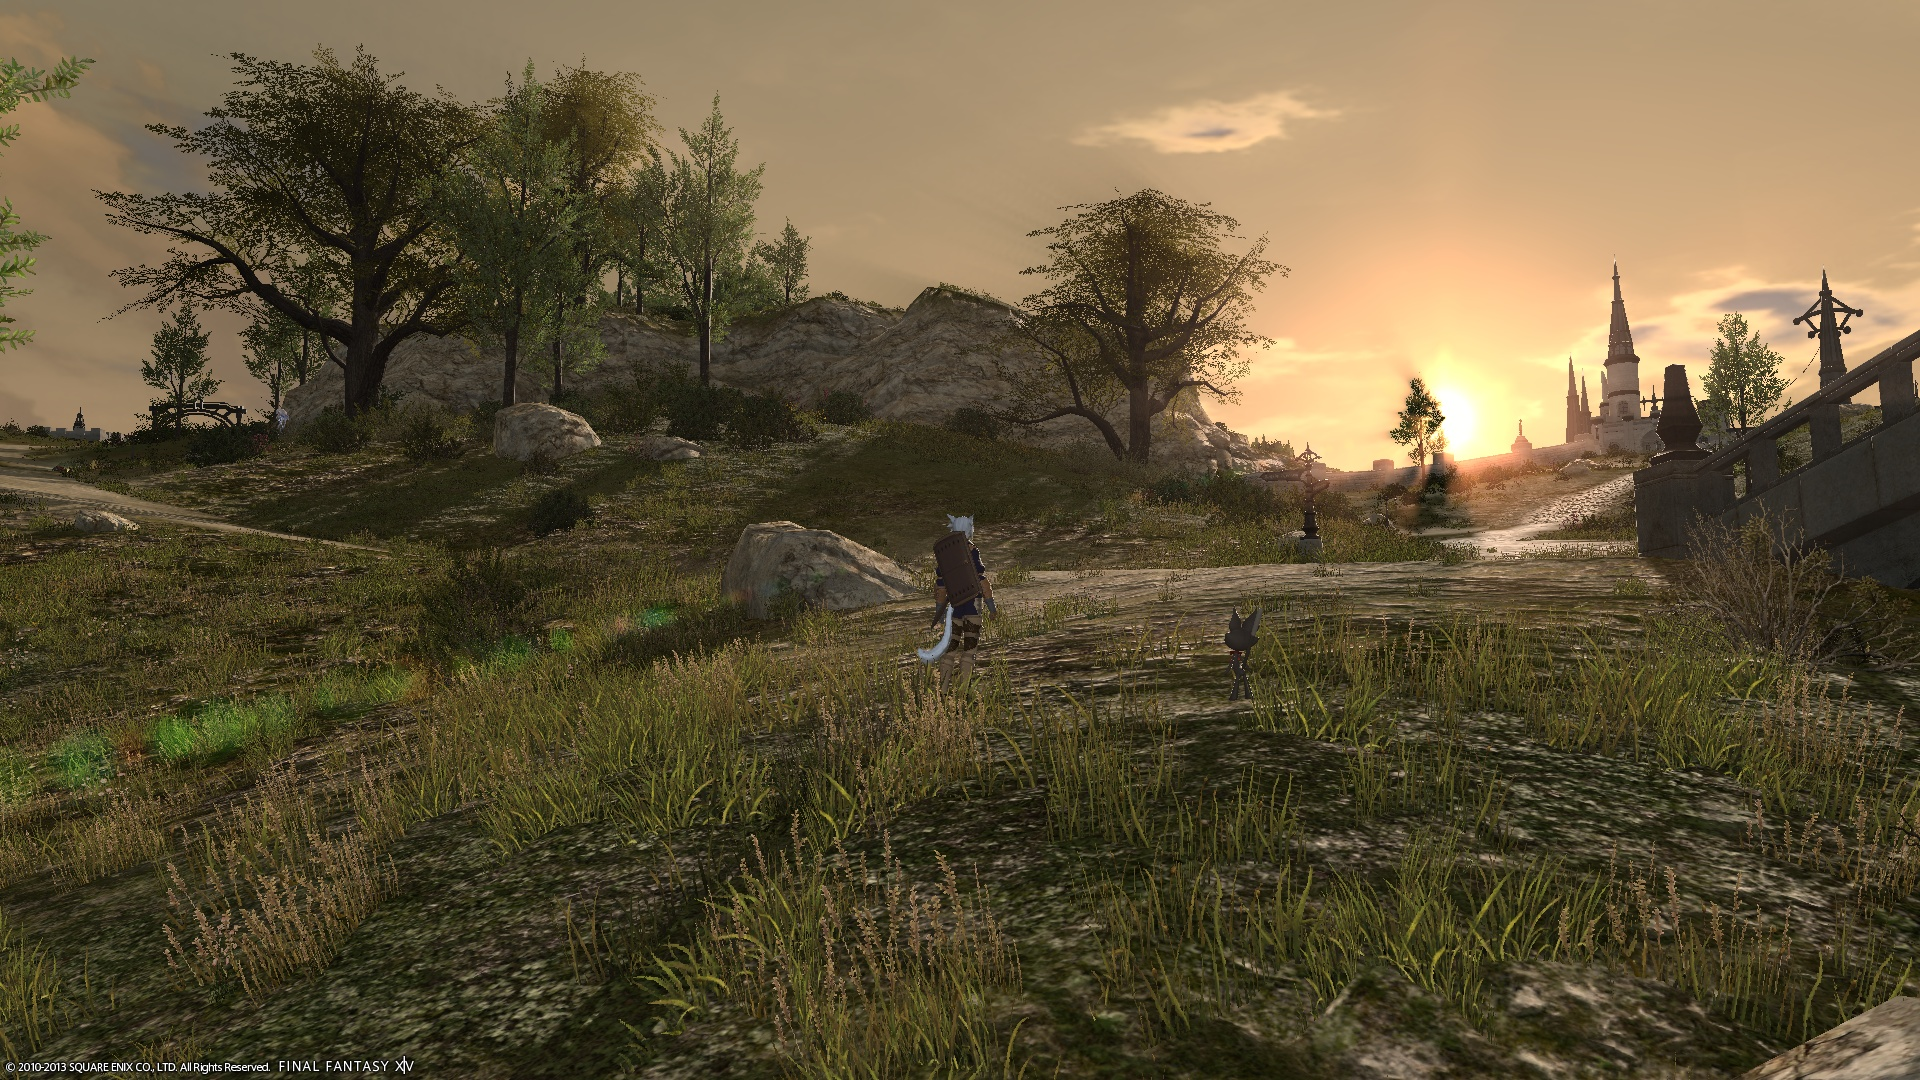 FFXIV:新生エオルゼア PS3版にて高解像度でゲームをプレイする方法 #FF14